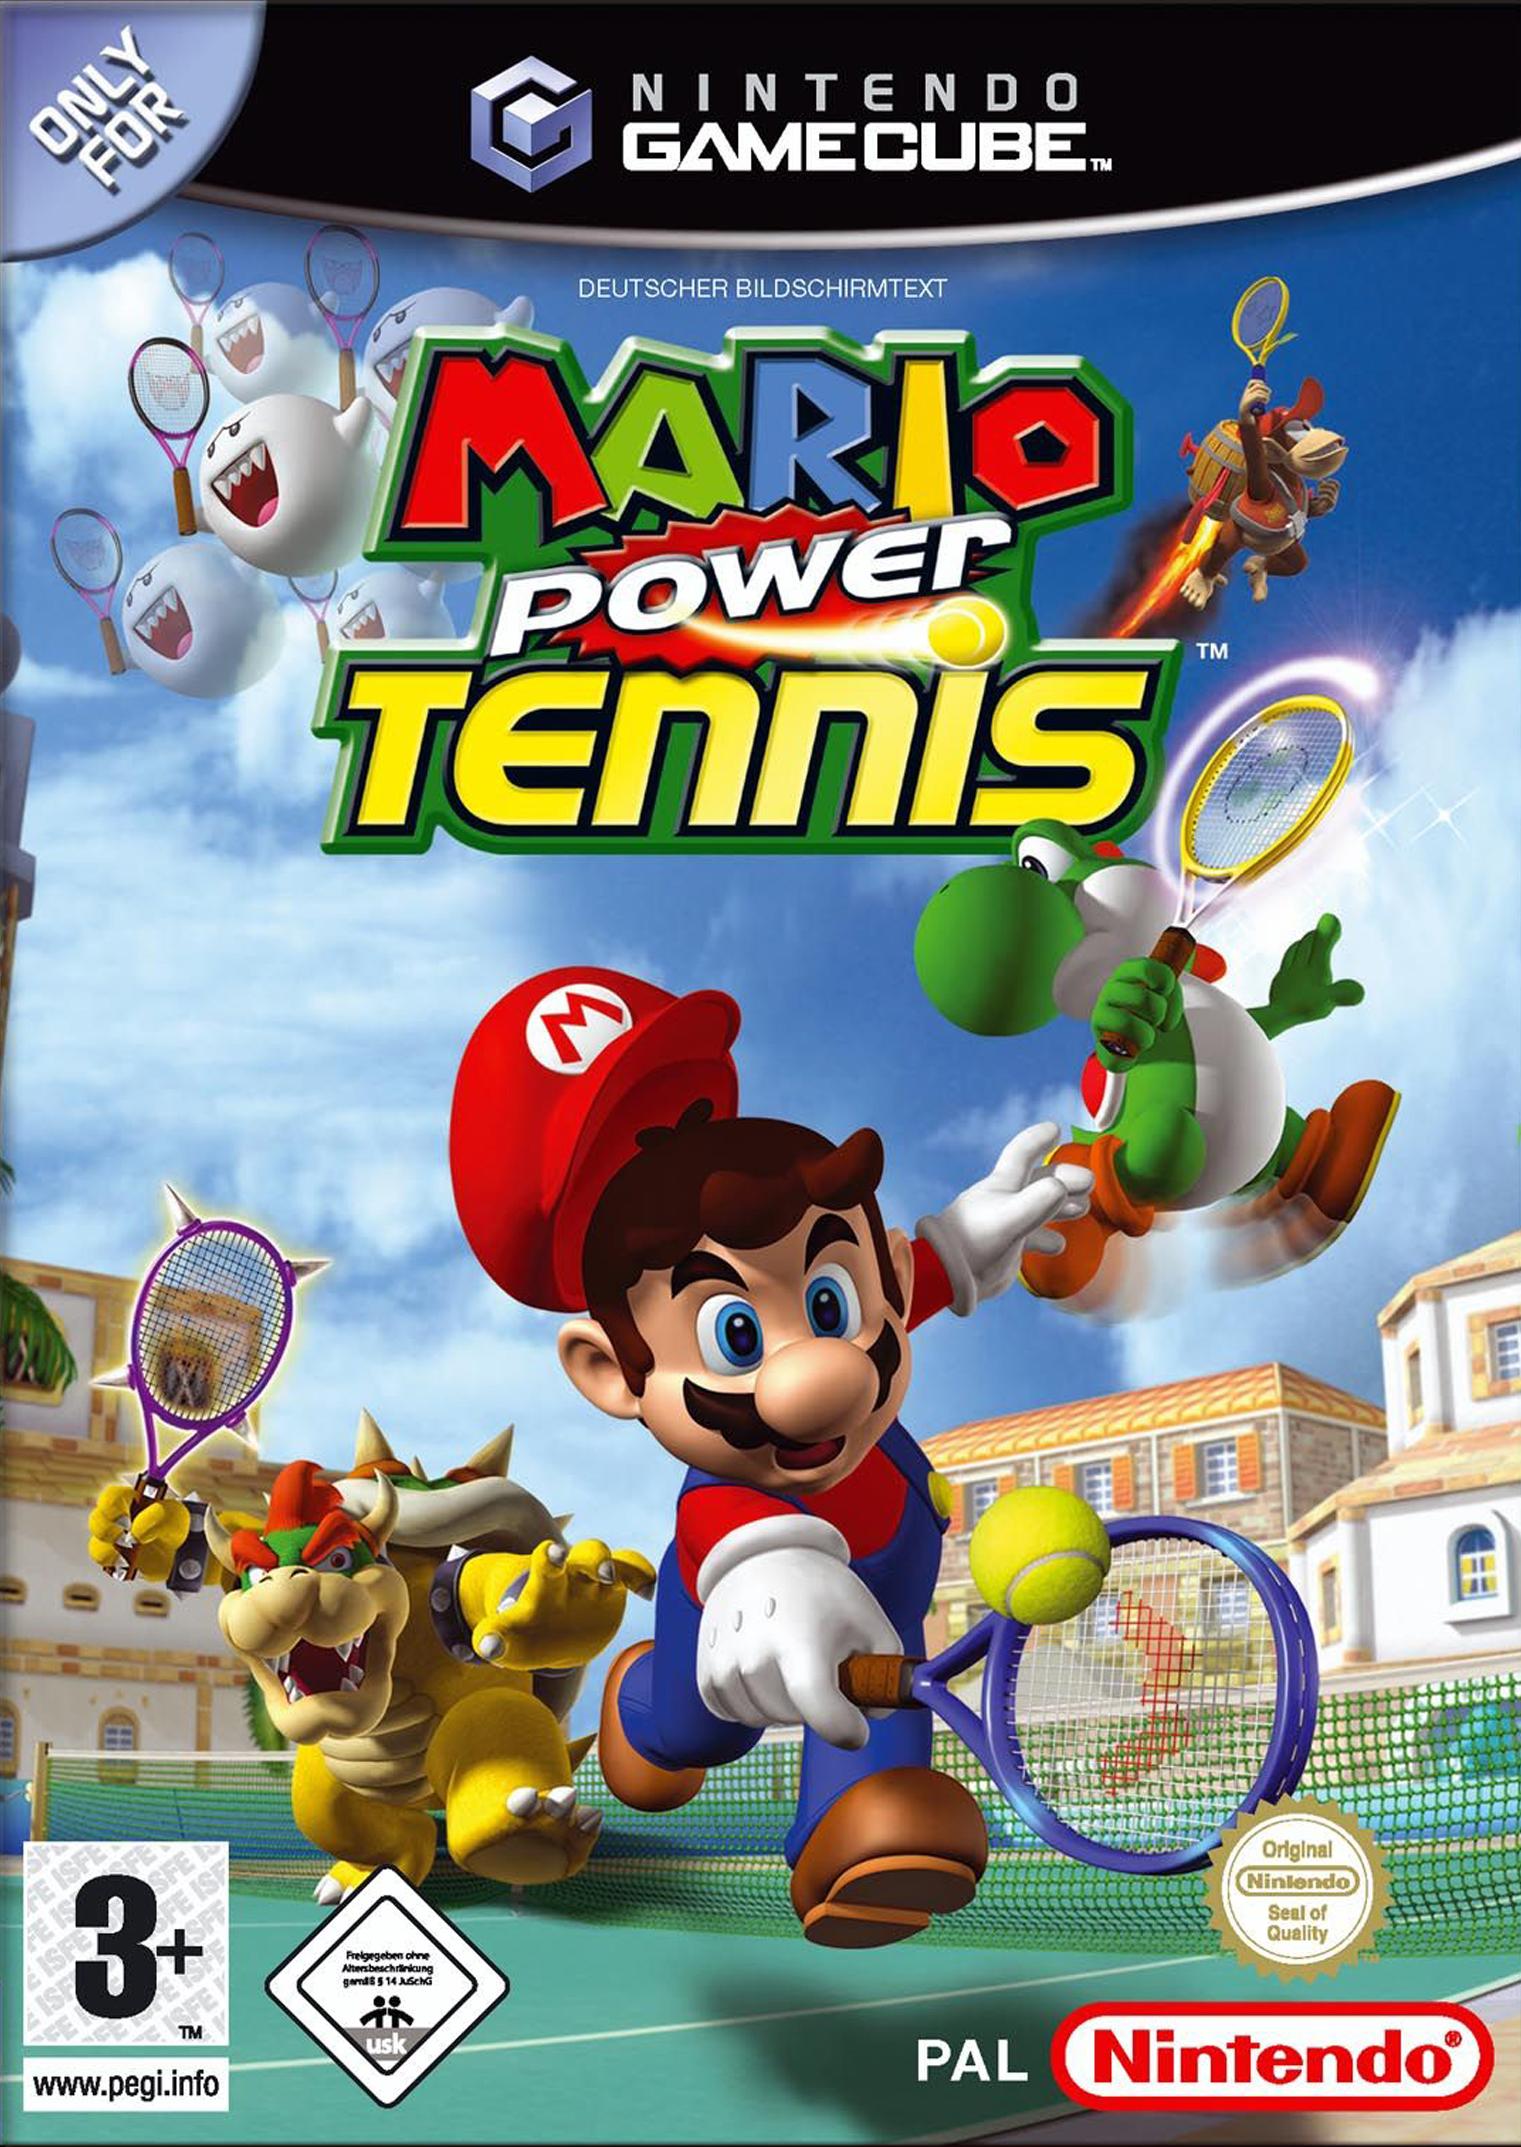 Mario Power Tennis (Nintendo GameCube)